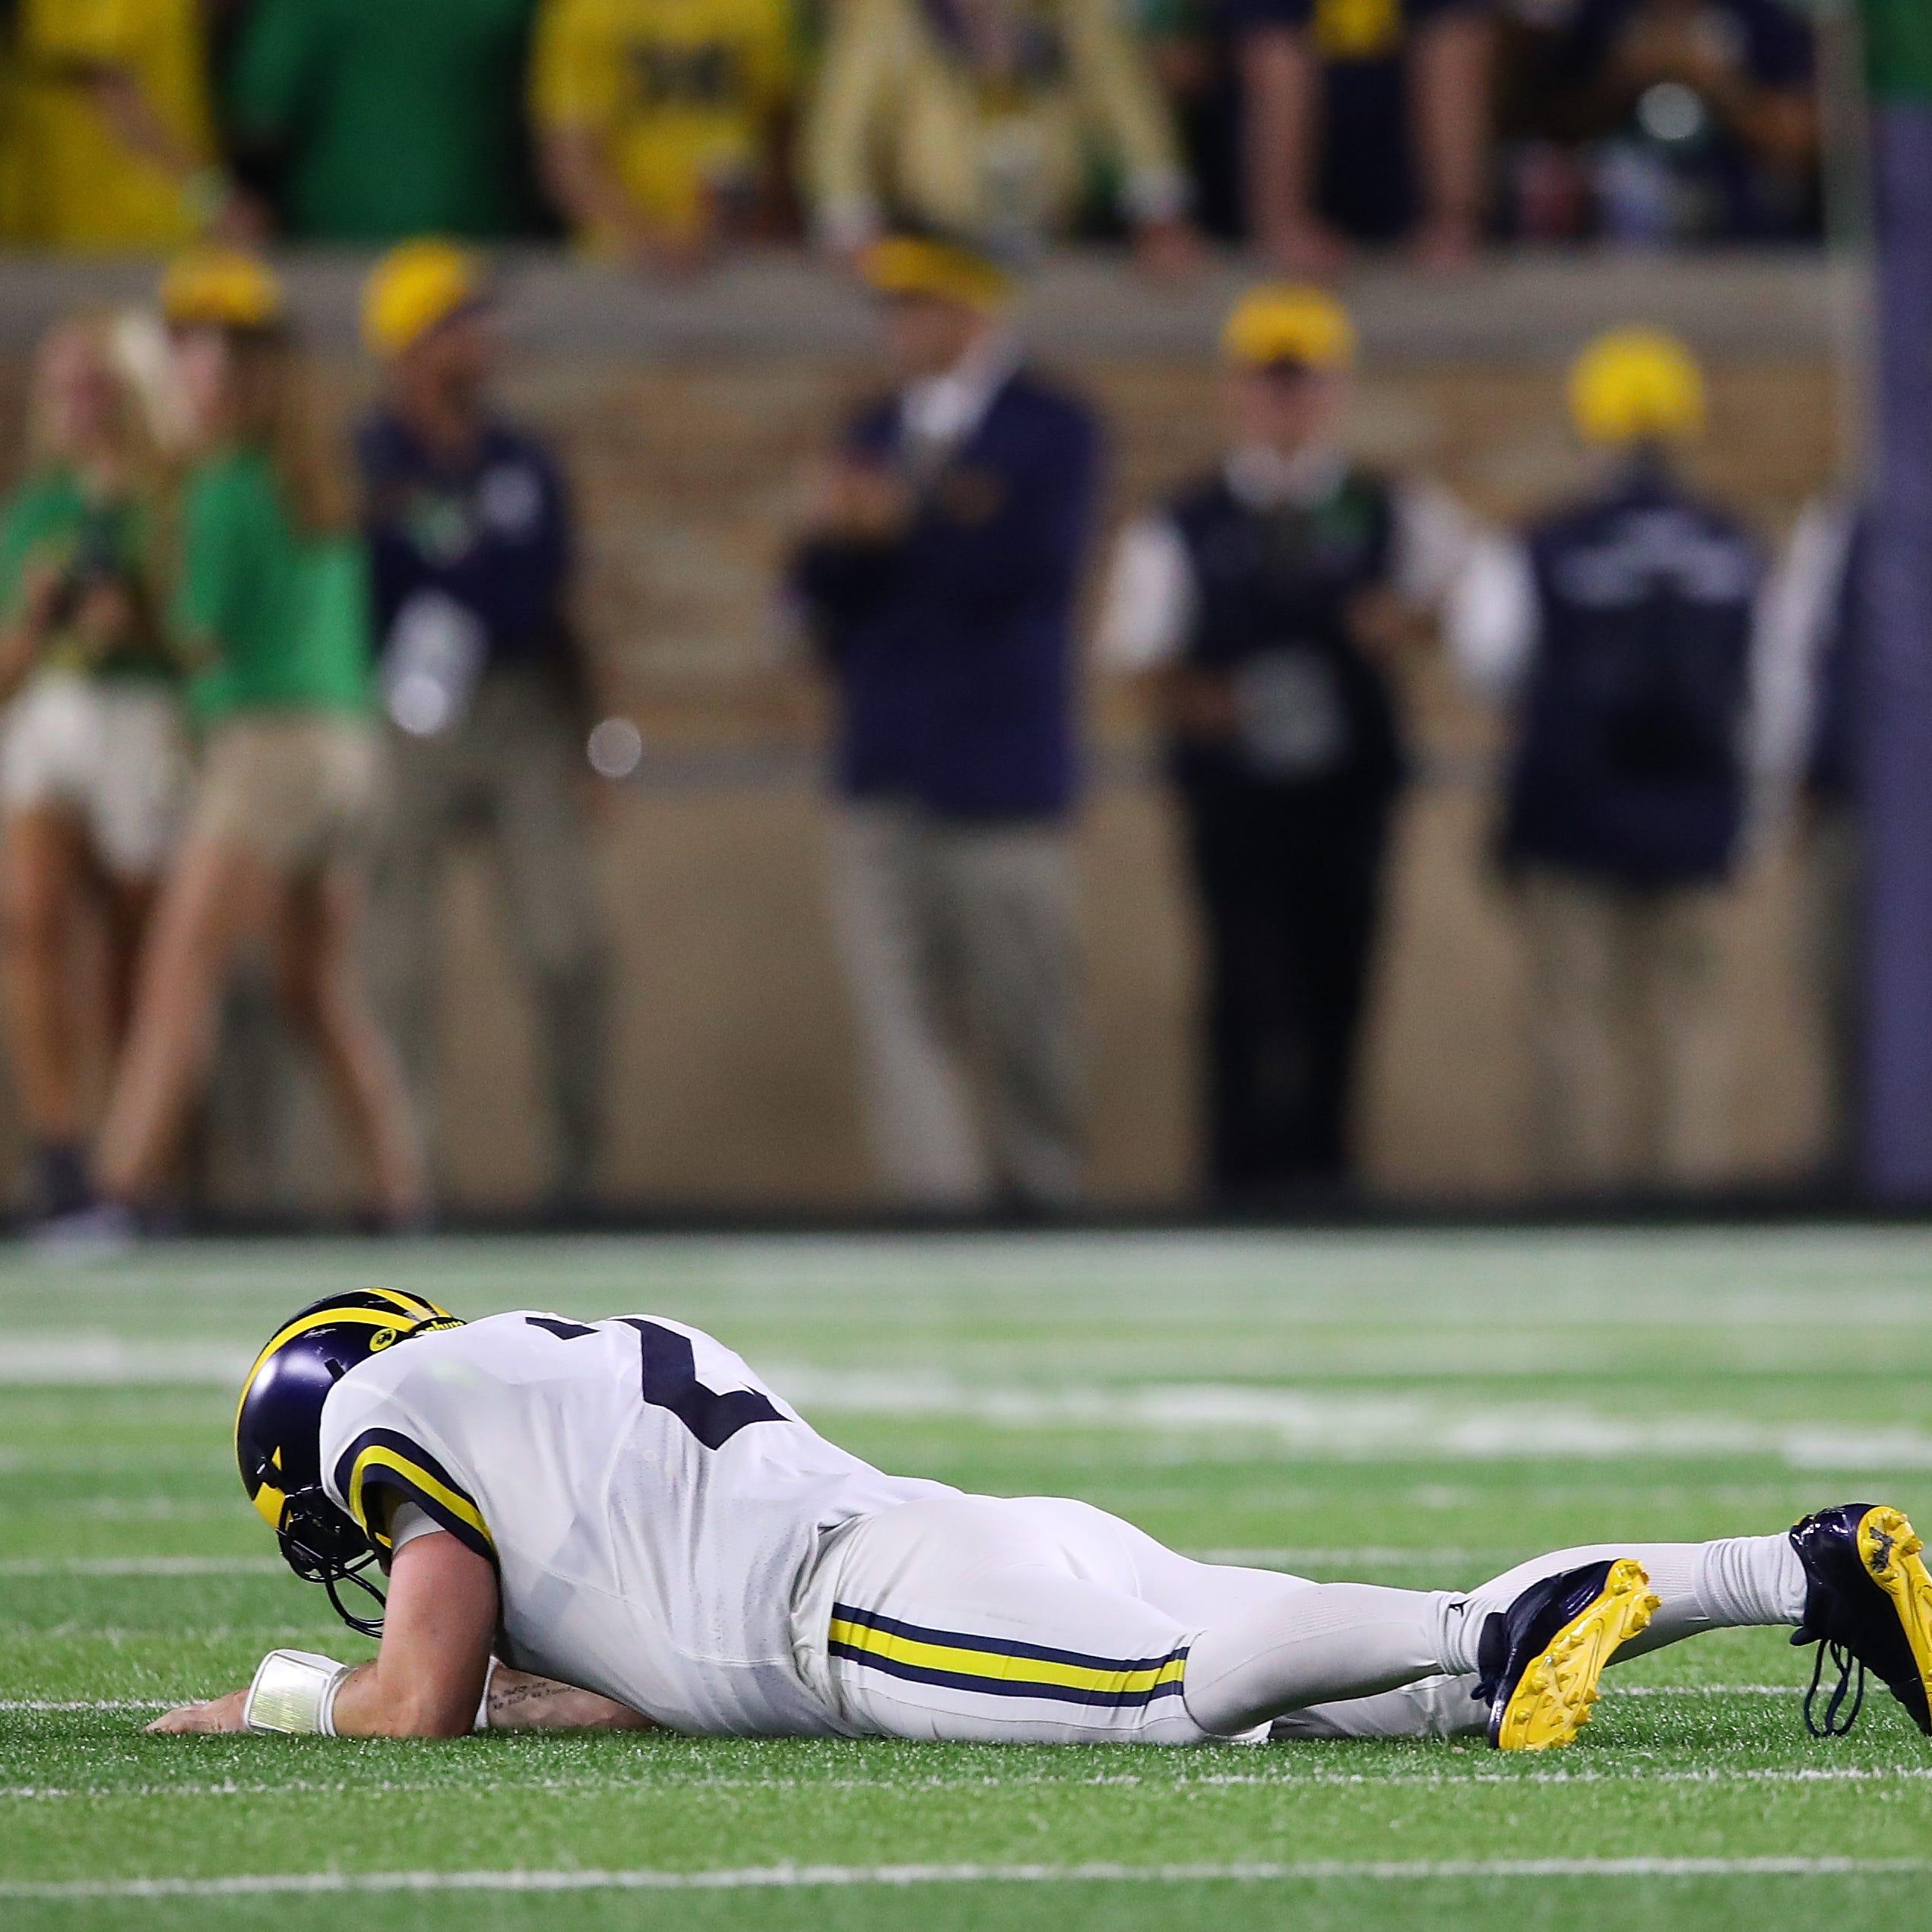 Michigan football's Shea Patterson showed he's human, not the savior